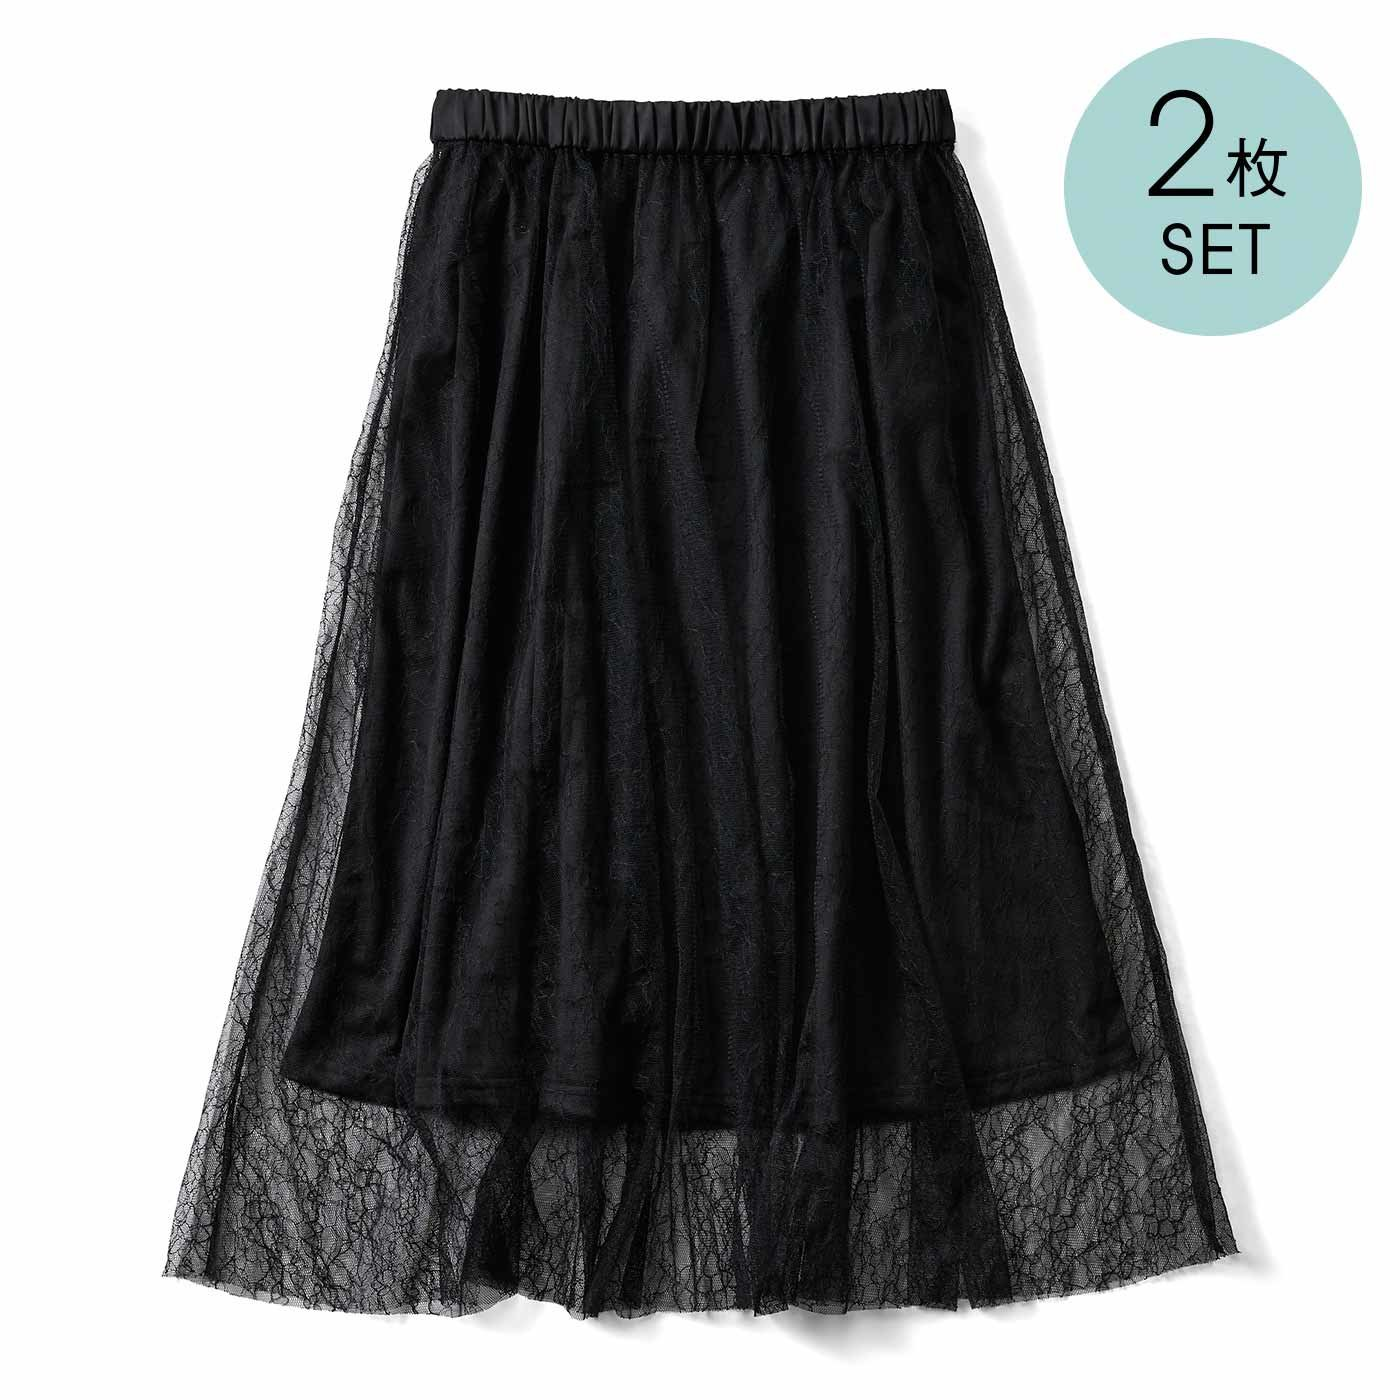 IEDIT[イディット] コーデの幅が広がる チュールレーススカートセット〈ブラック〉